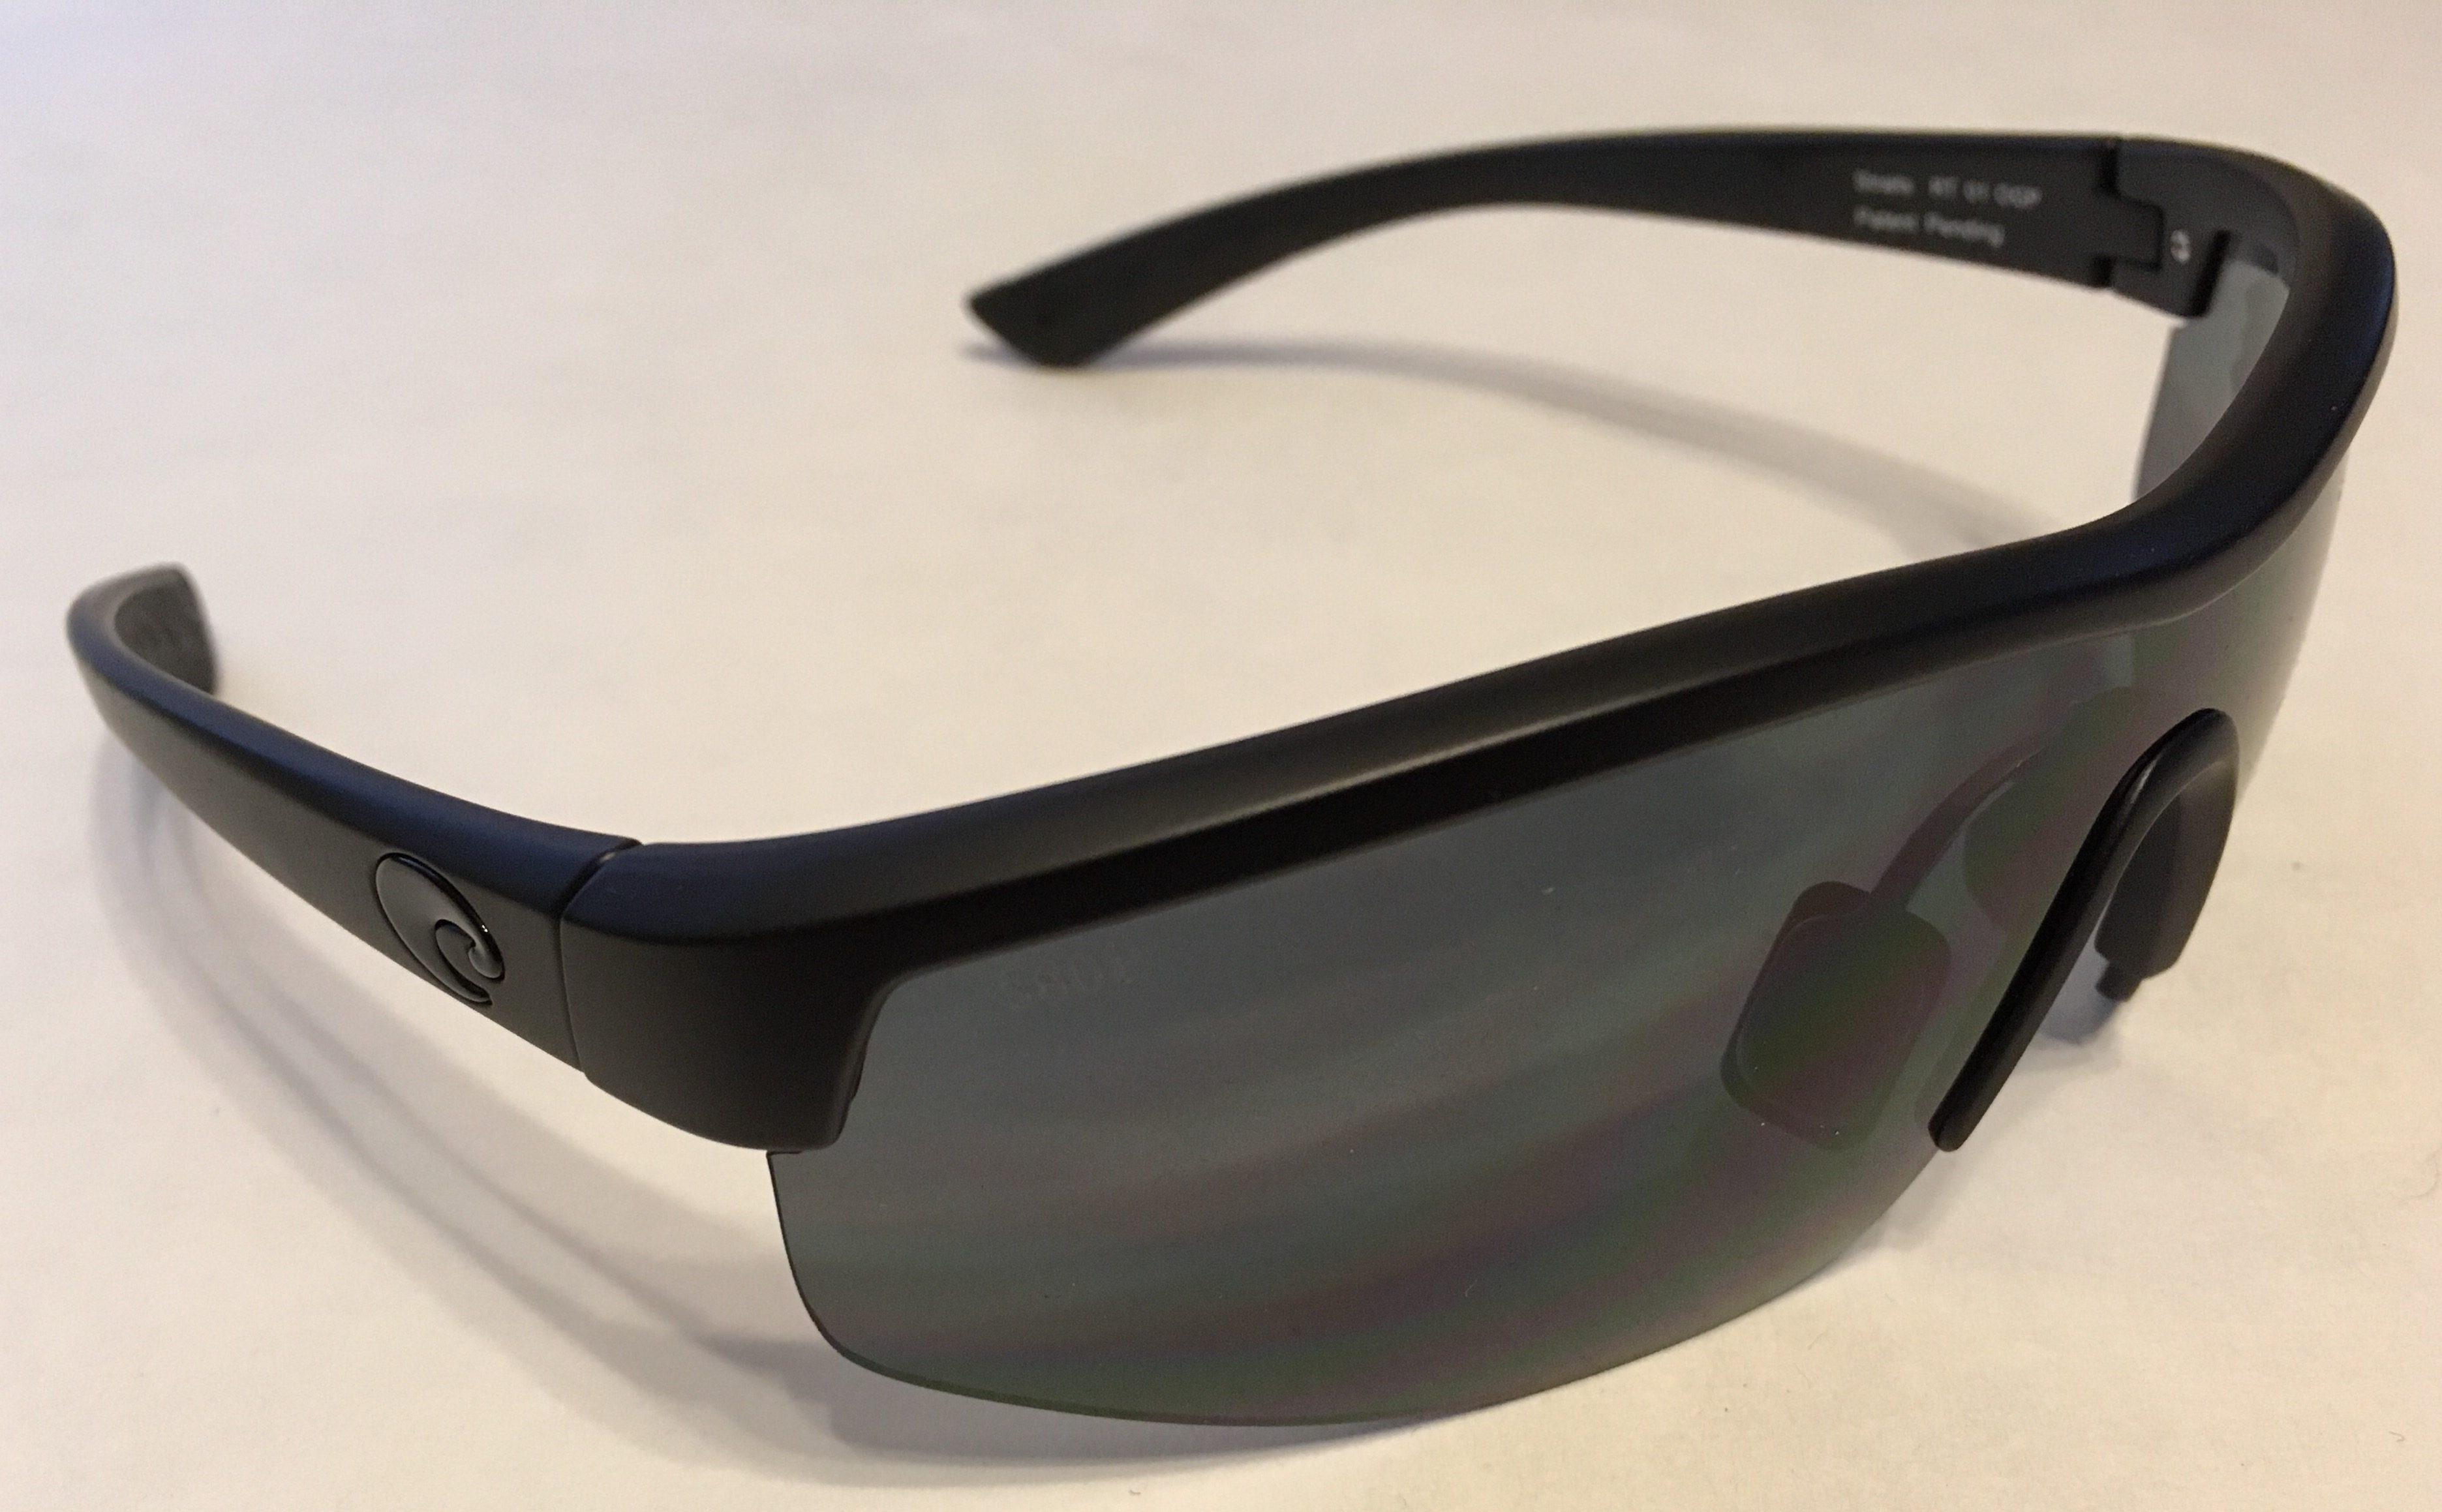 Costa Del Mar Straits Sunglasses - Blackout Black - POLARIZED Gray 580P